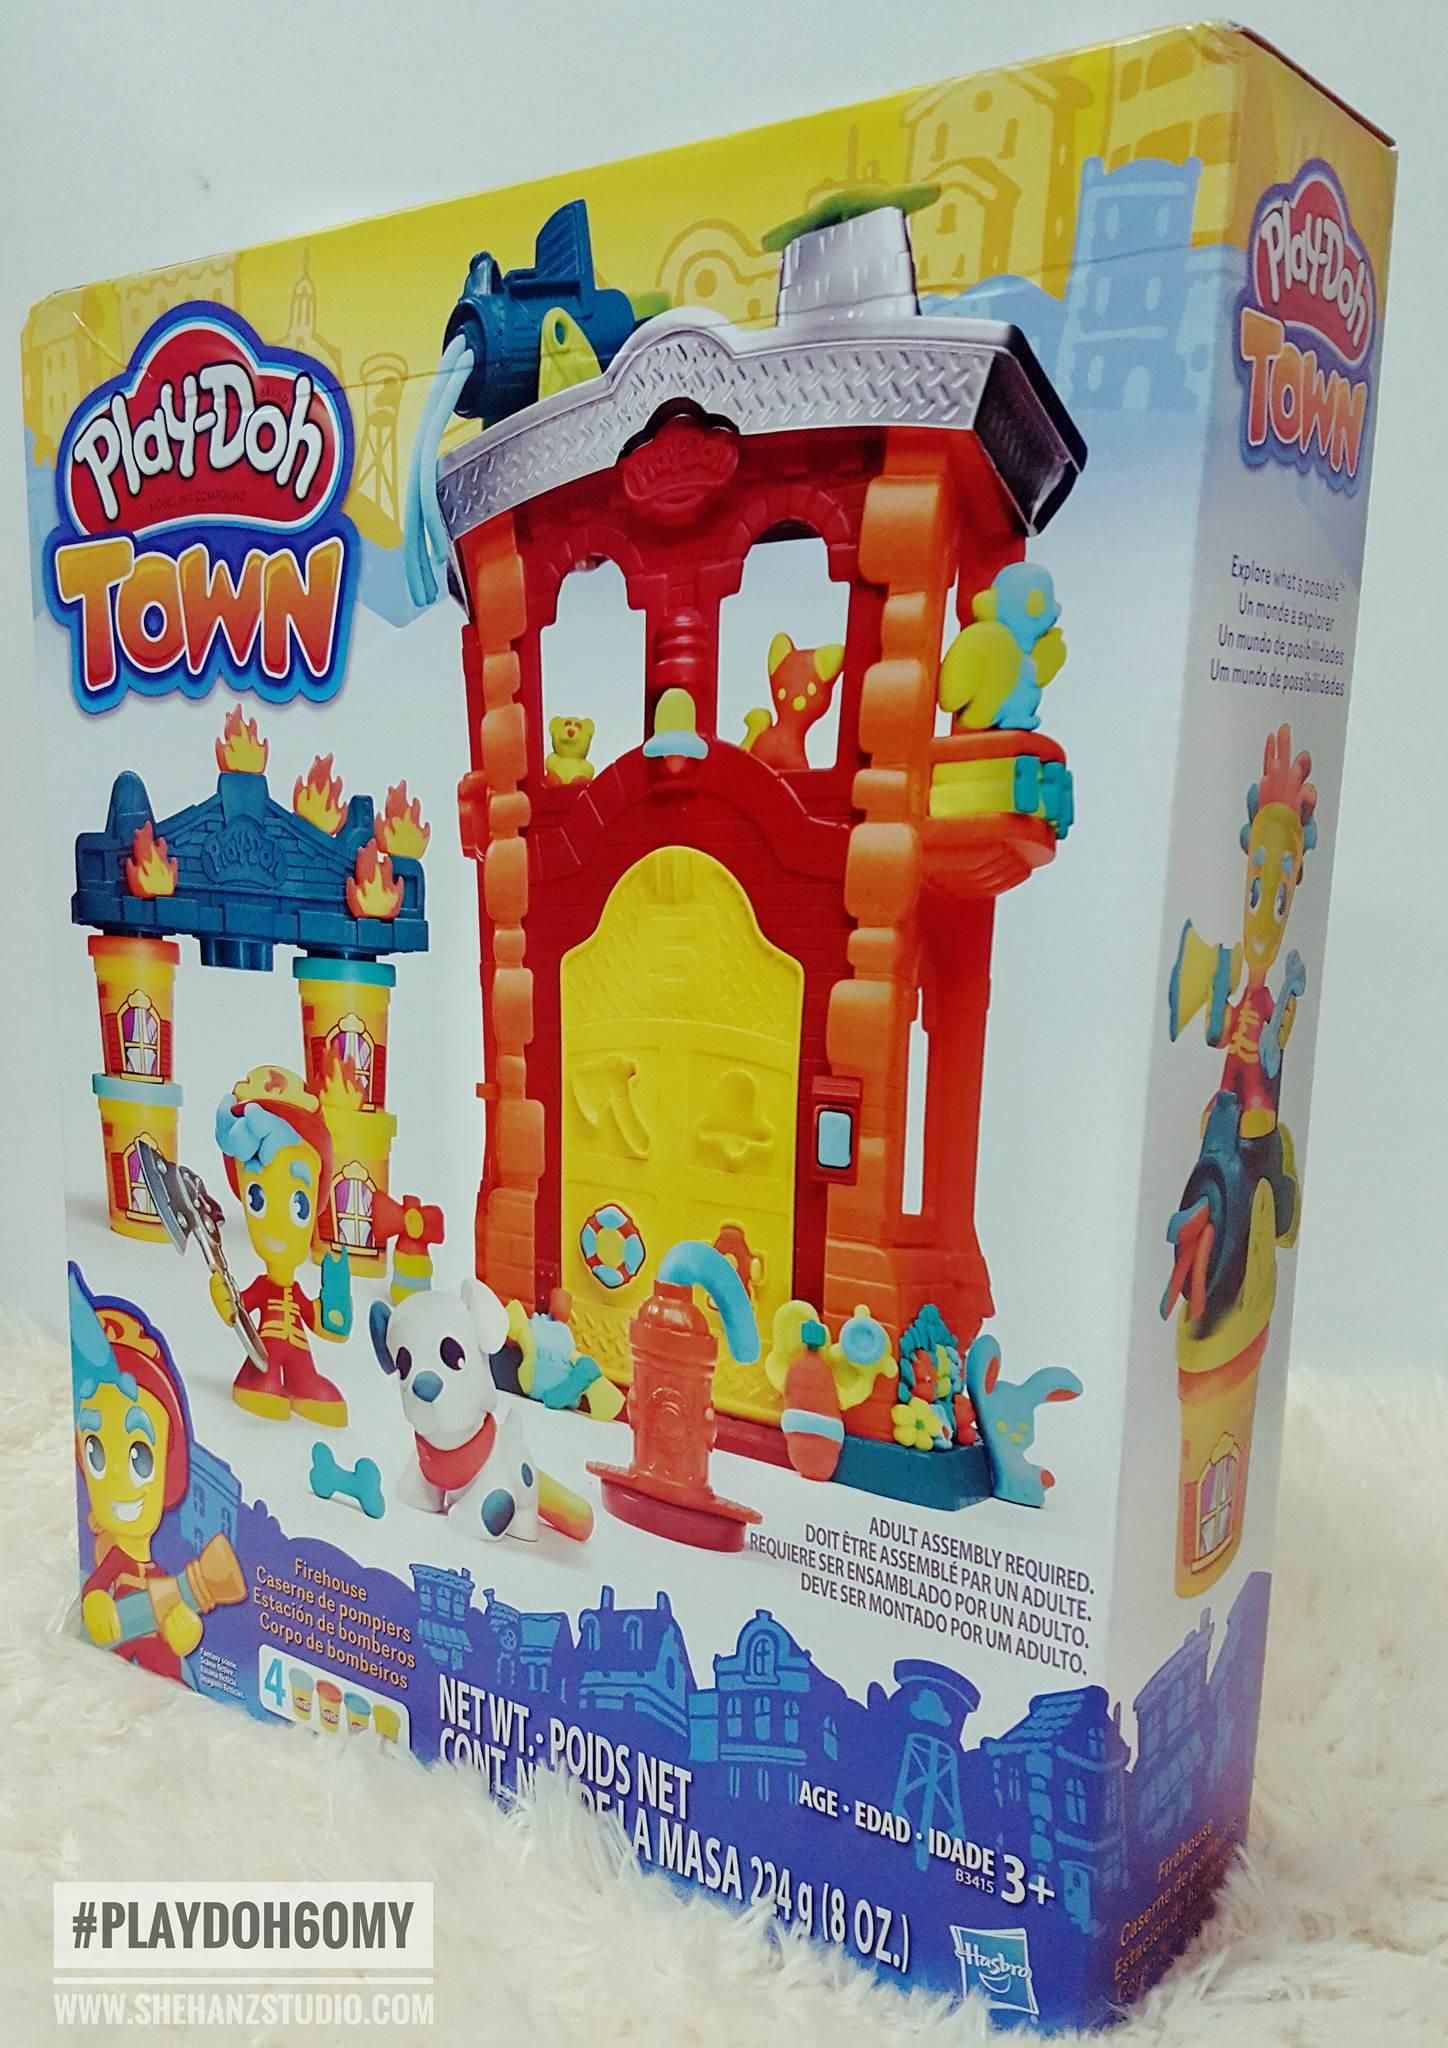 6-kelebihan-bermain-play-doh-town-firehouse-set-21